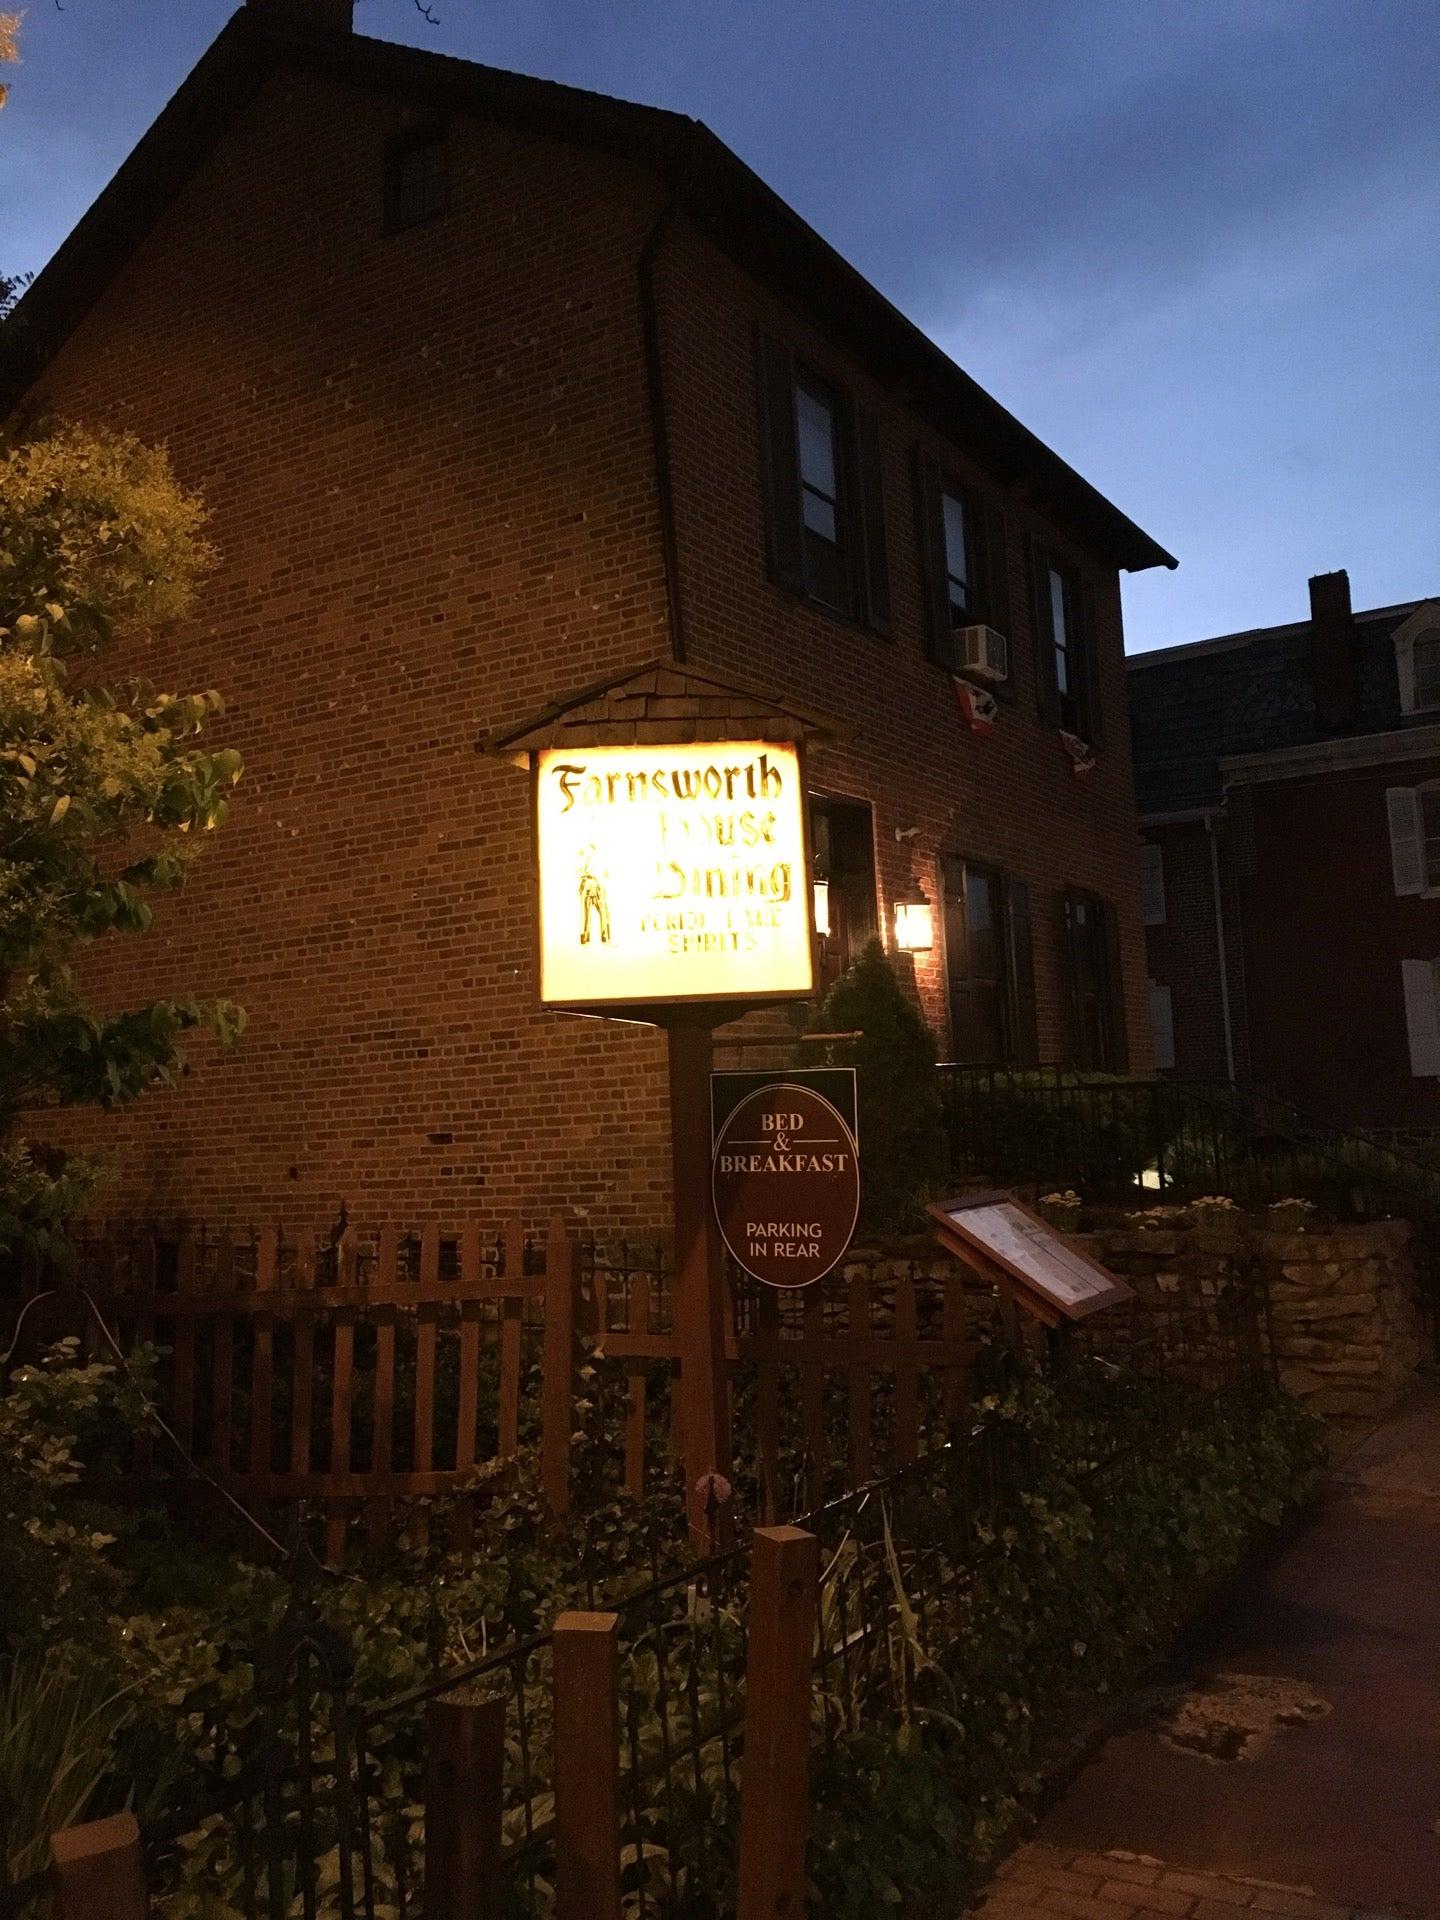 farnsworth house inn at 401 baltimore st (lincoln st.) gettysburg